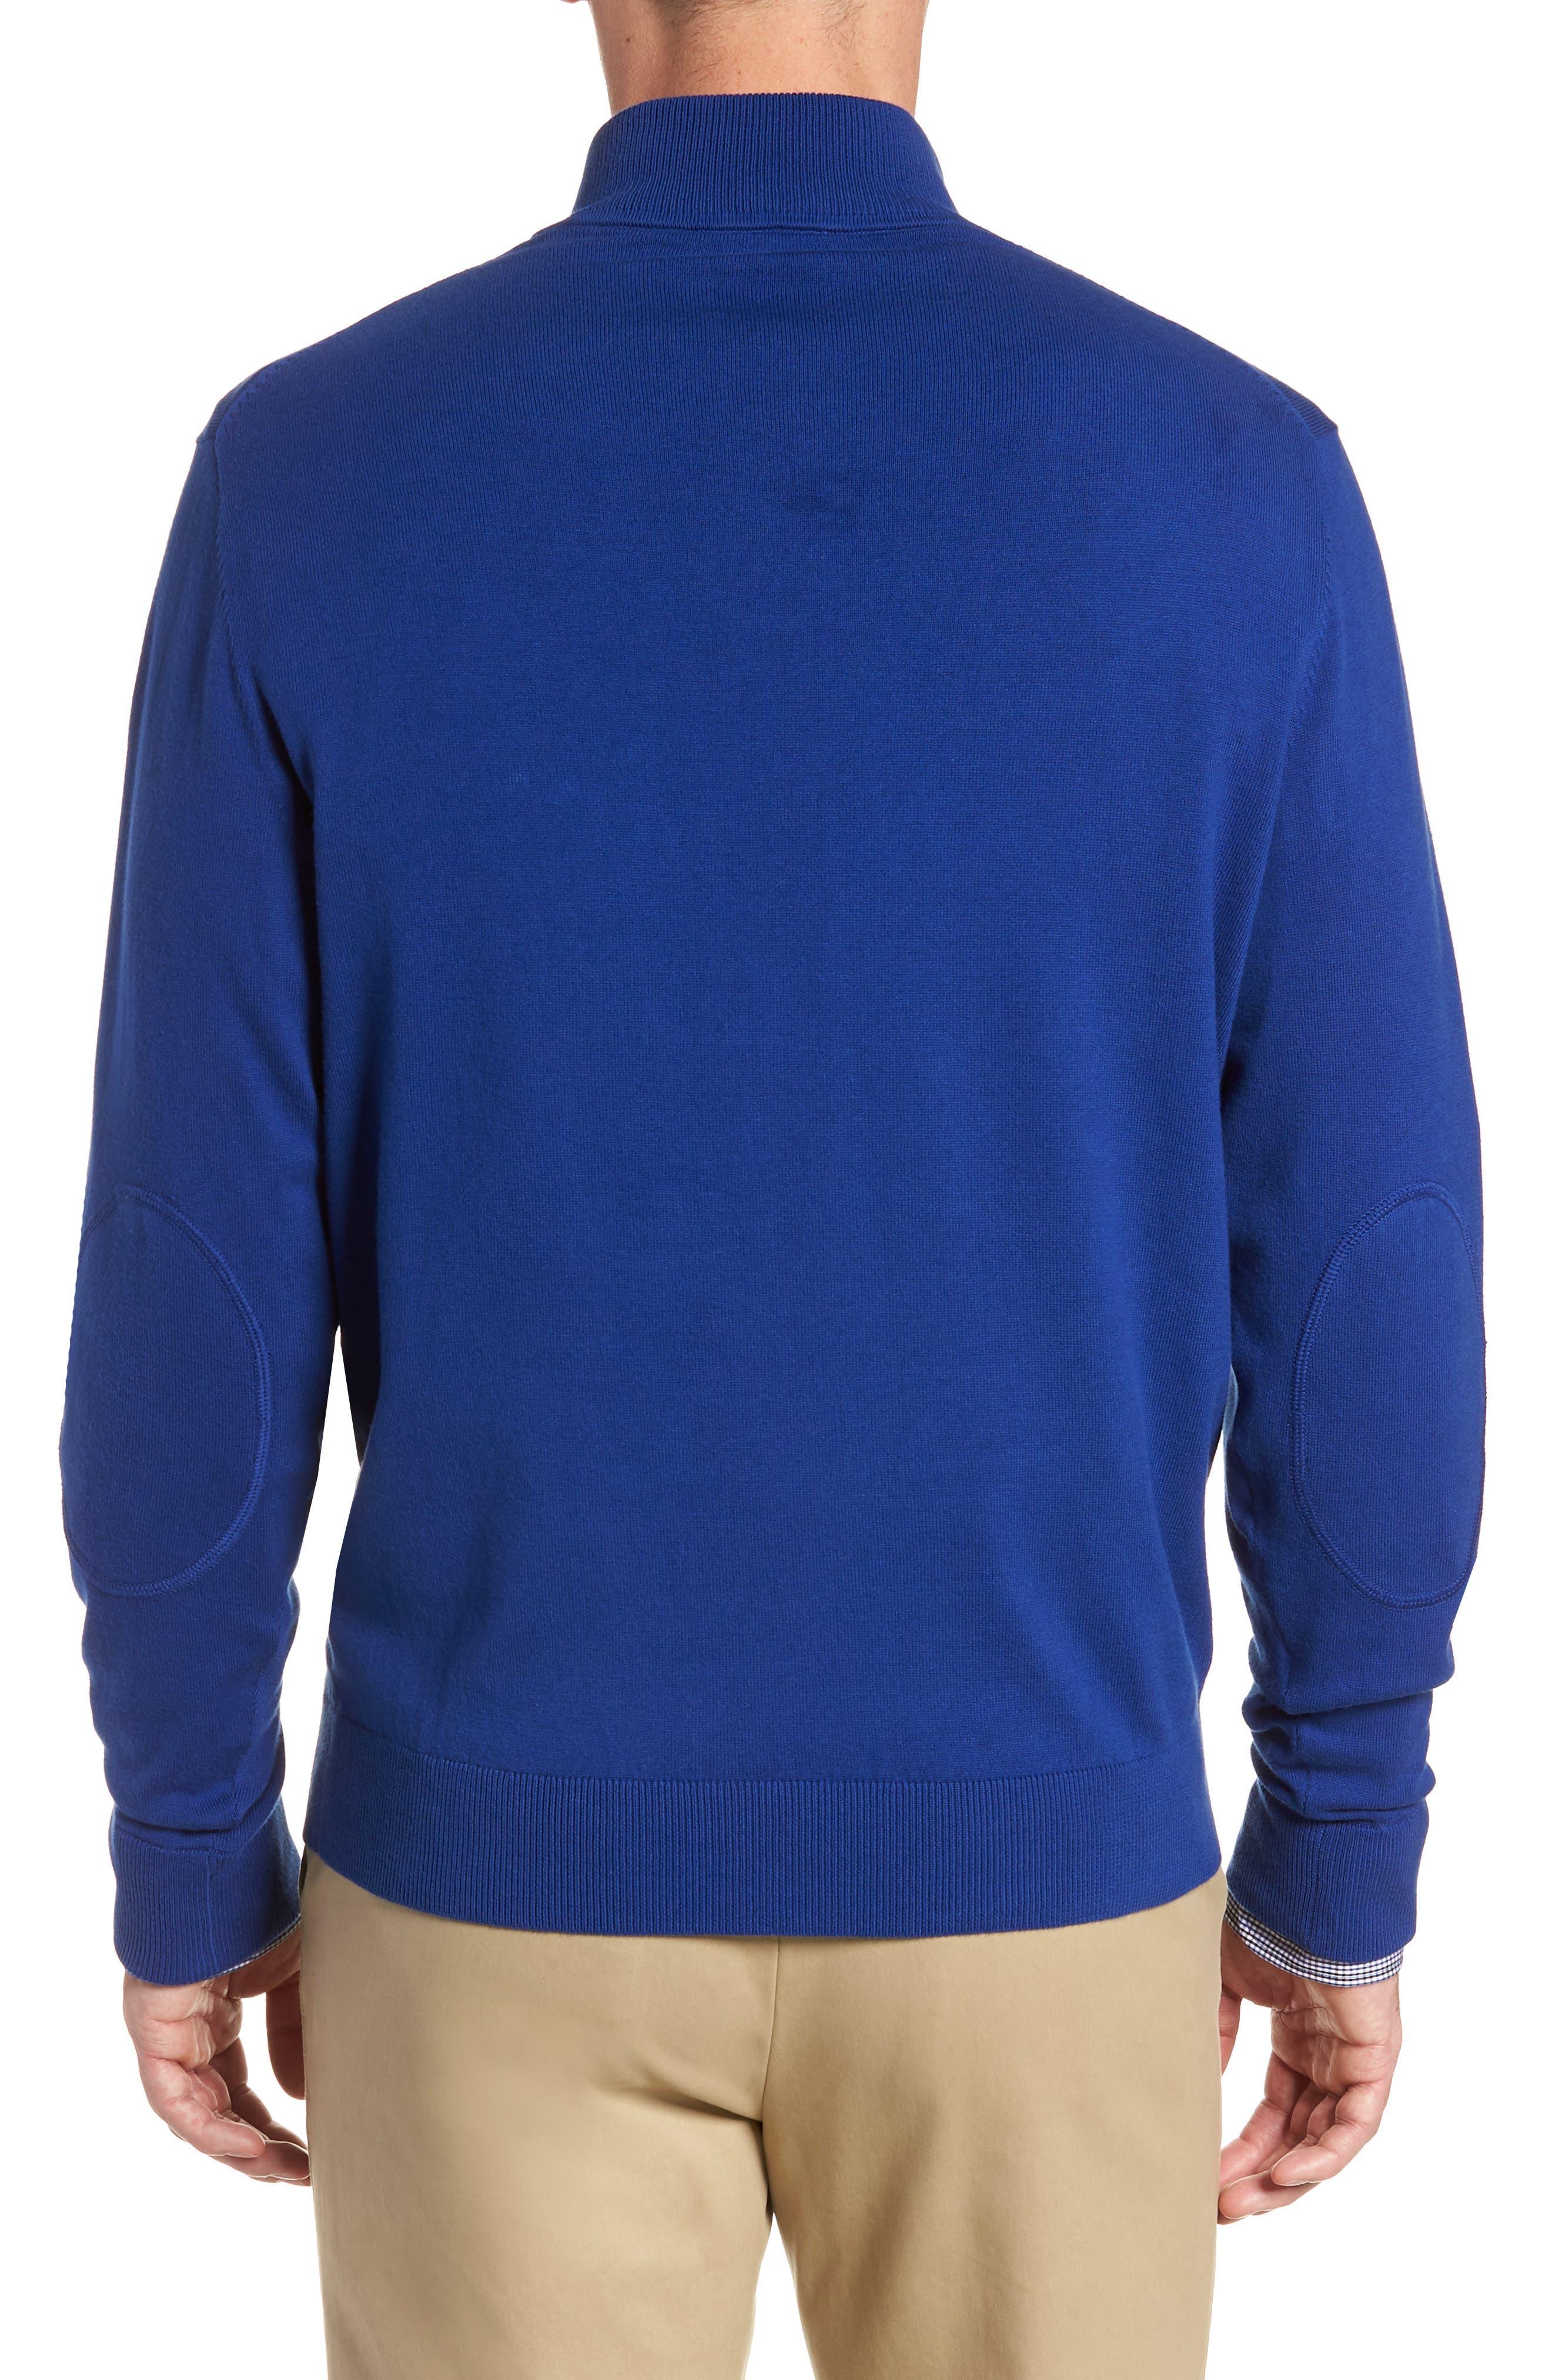 Lakemont Half Zip Sweater,                             Alternate thumbnail 2, color,                             BOLT